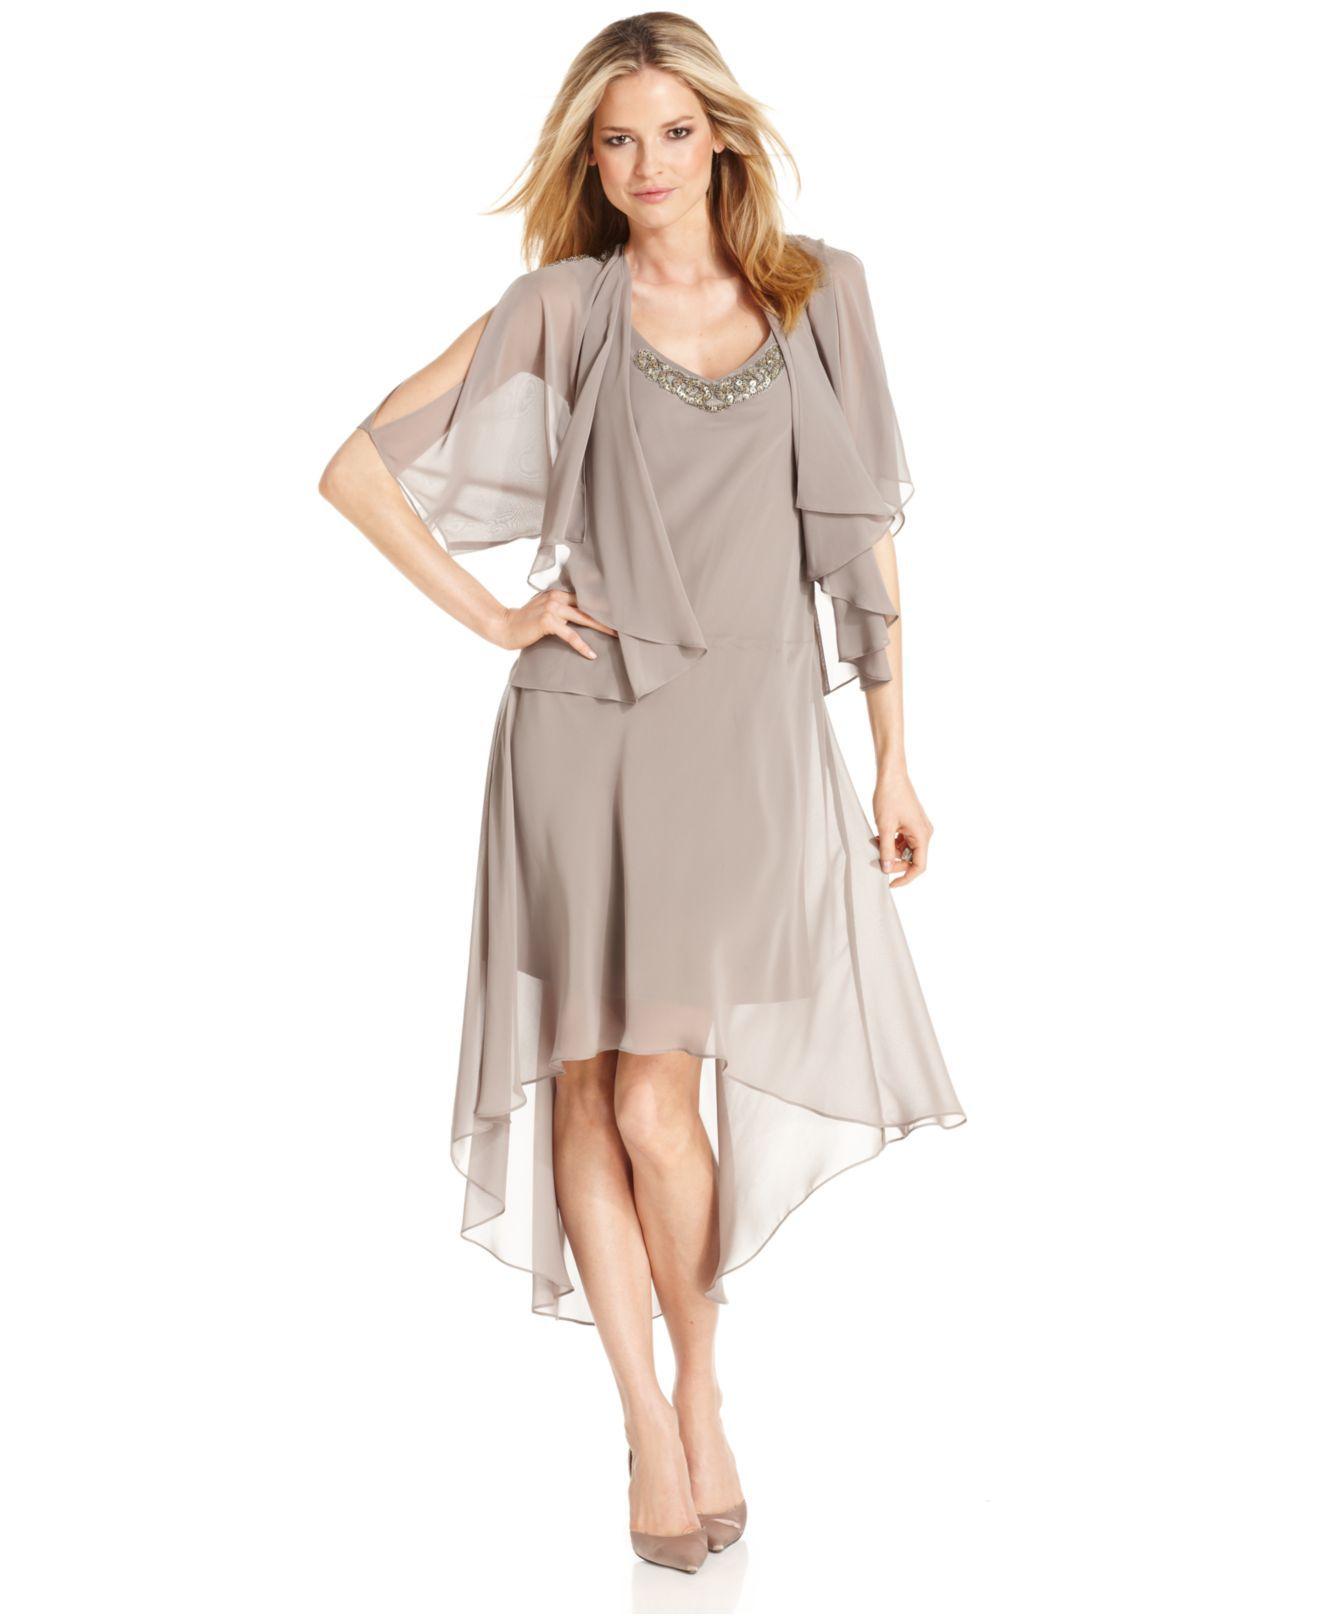 Sl sl fashion dresses - Sl Fashions Dress And Jacket Sleeveless Beaded High Low Hem Womens Mother Of